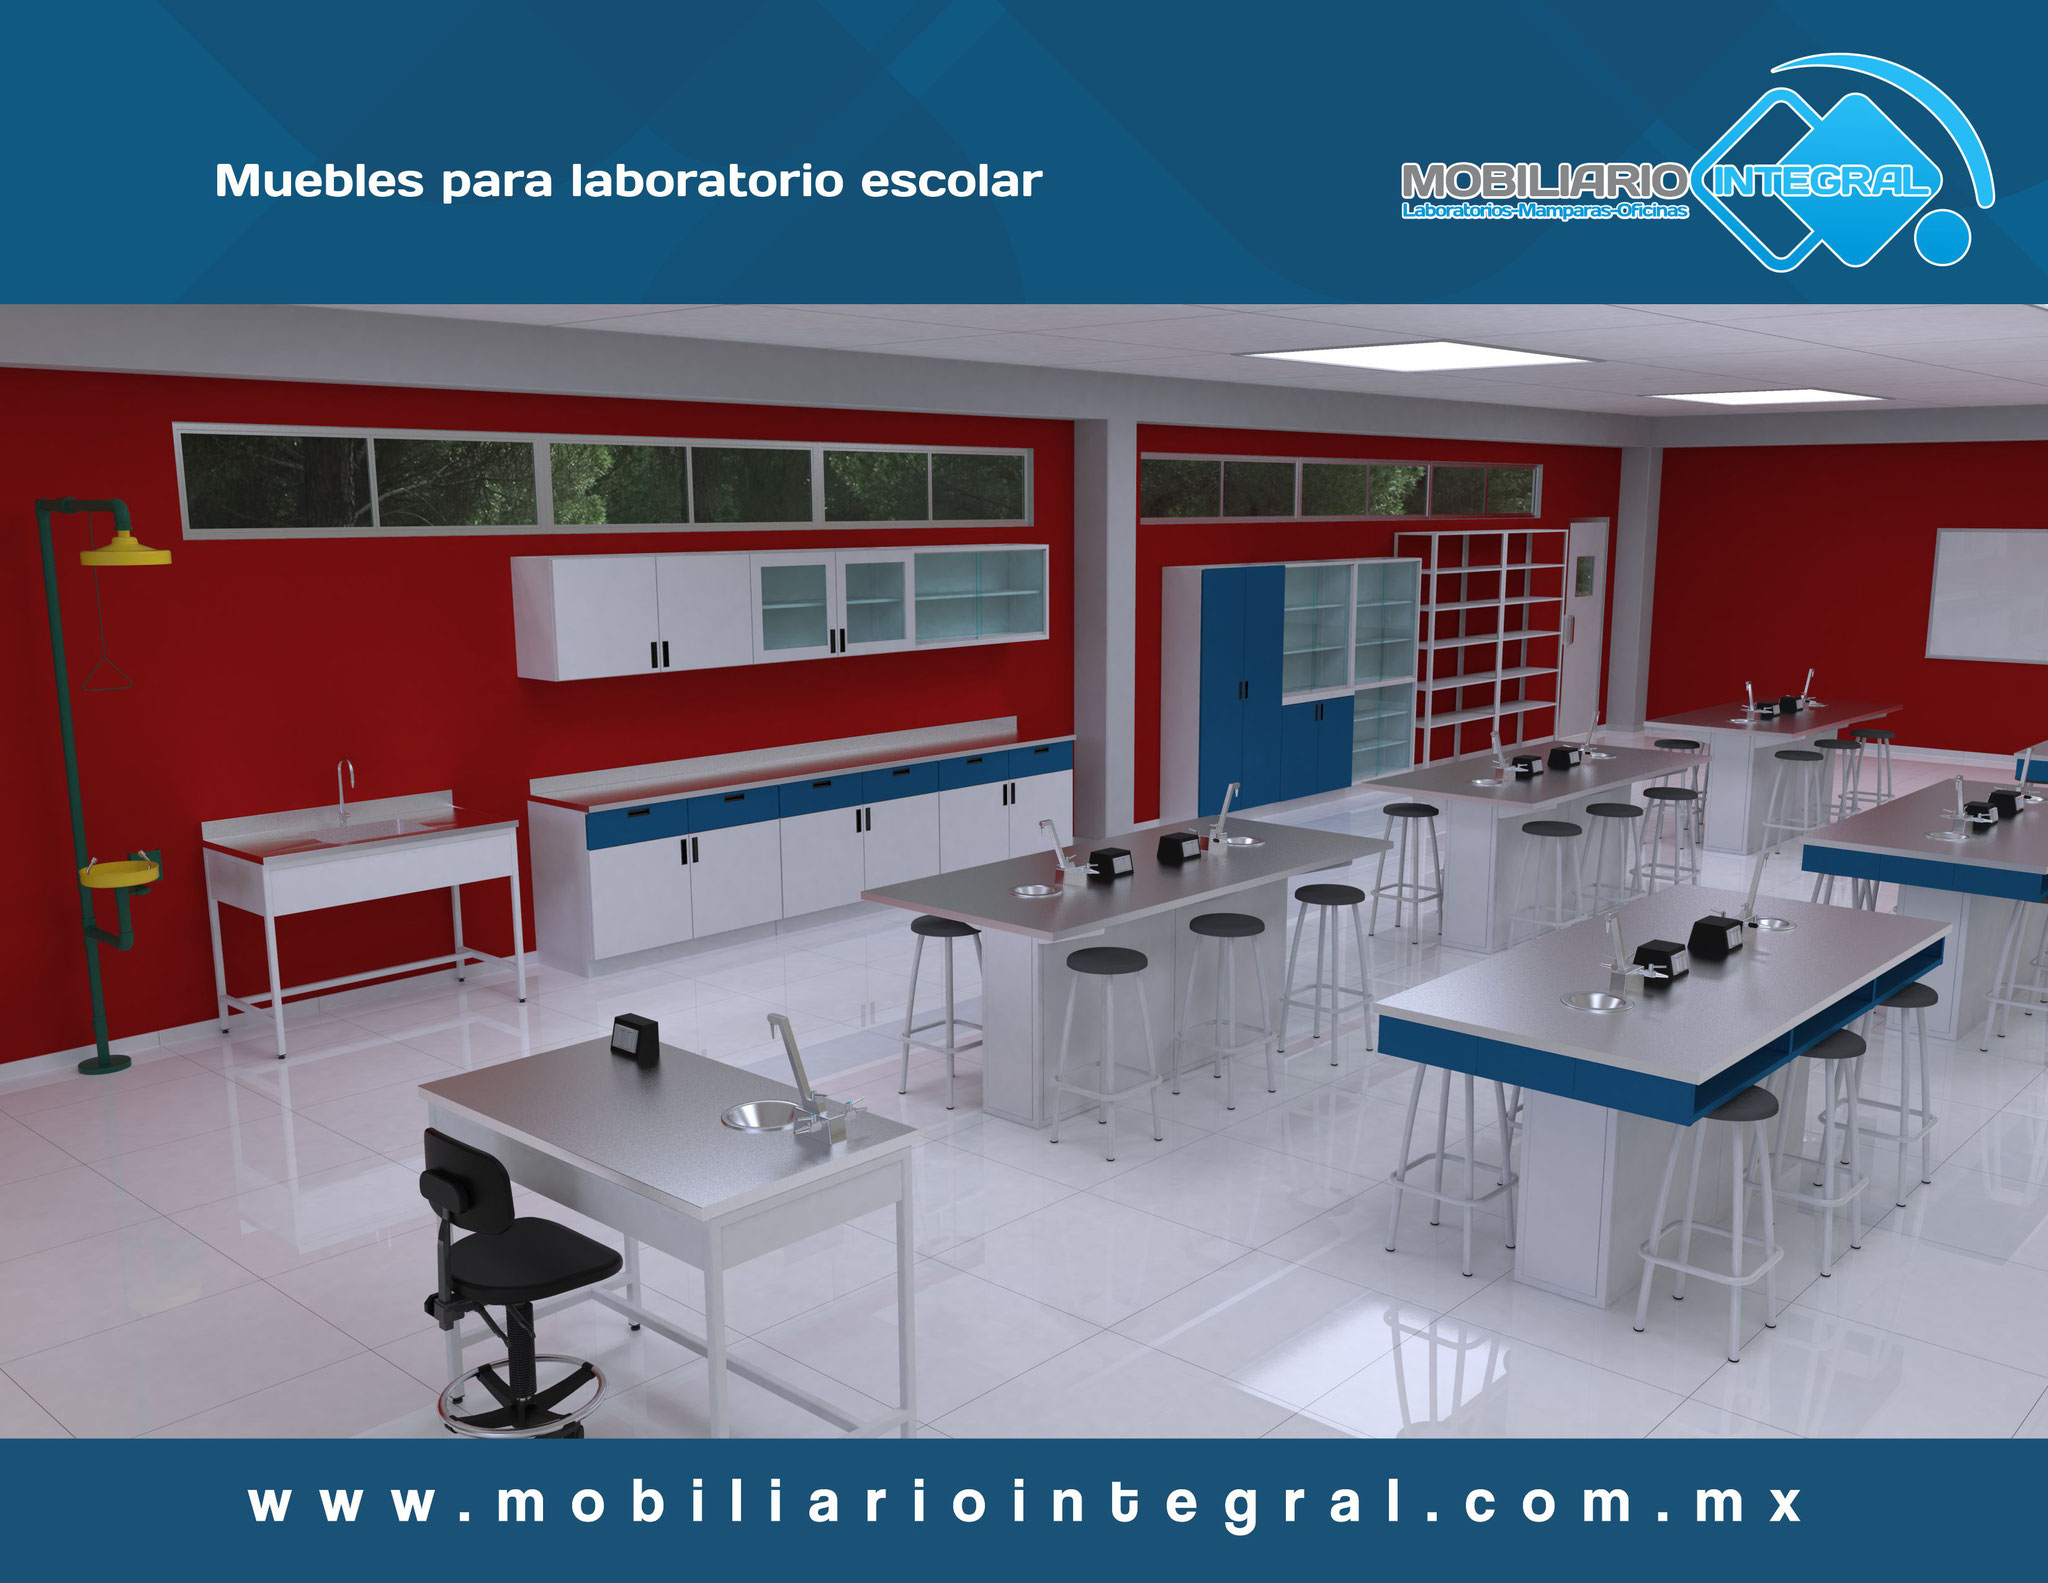 Muebles para laboratorio escolar Mexicali